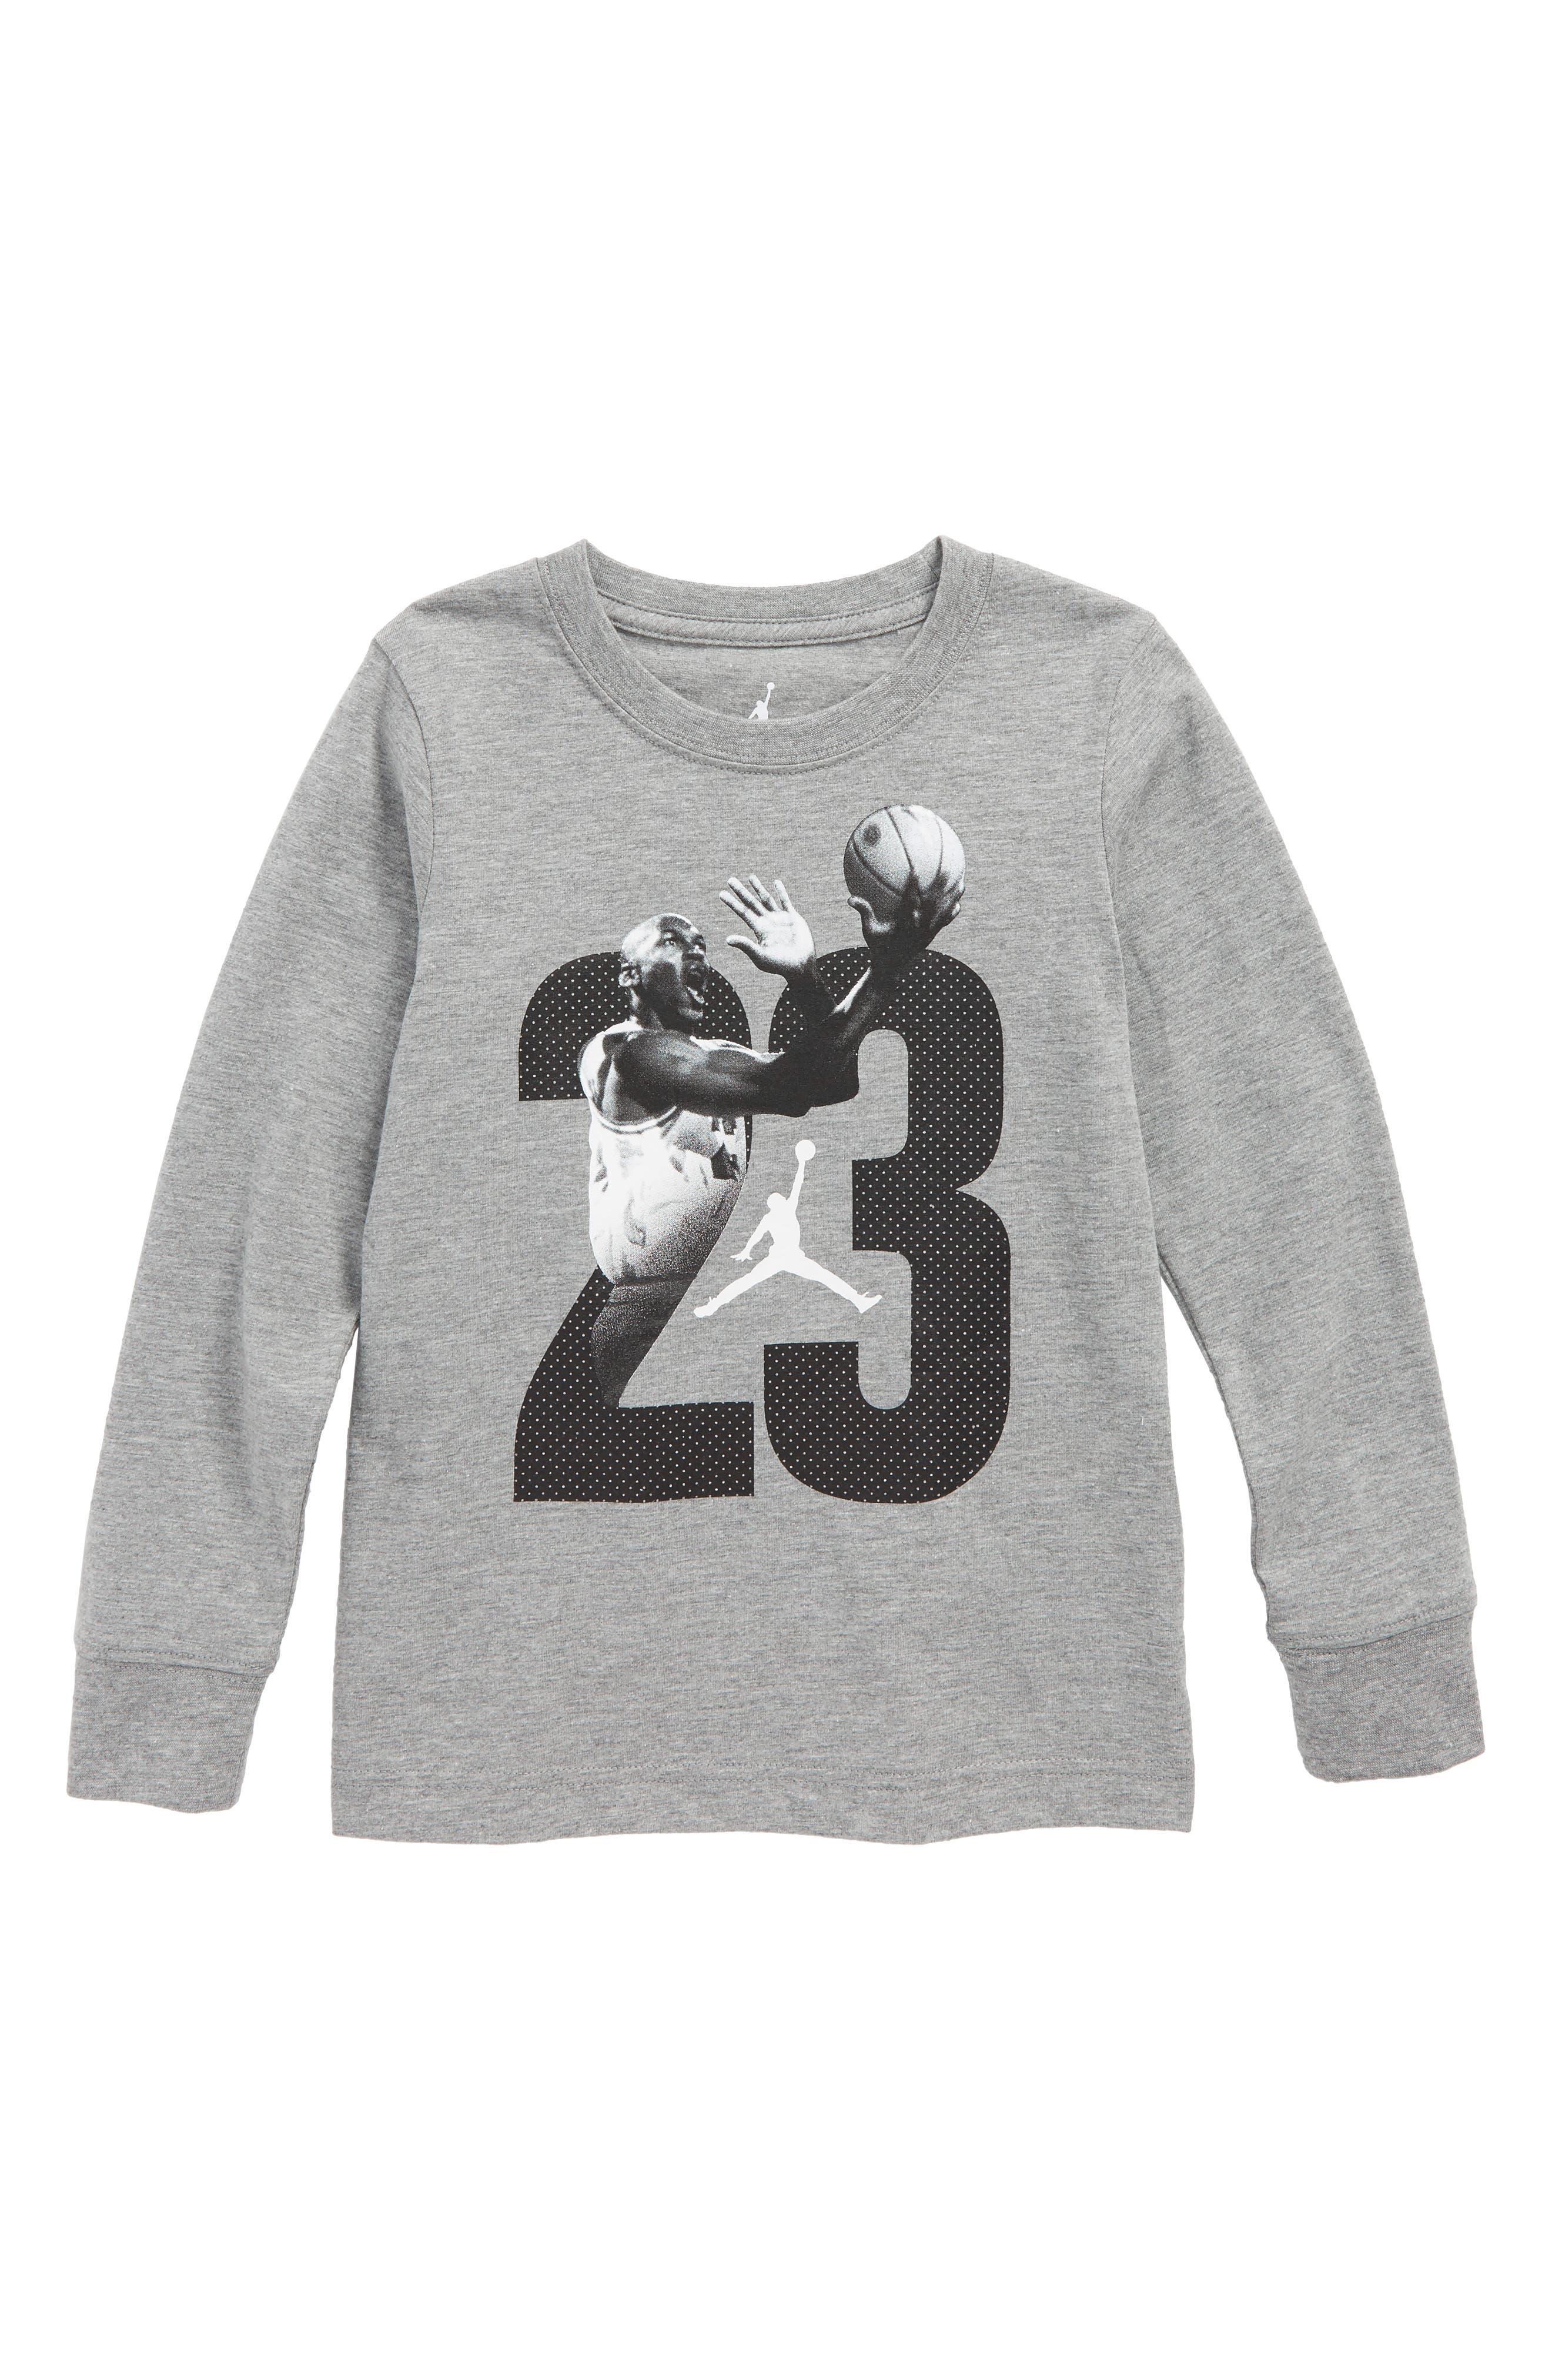 Main Image - Jordan 23 Graphic Long Sleeve T-Shirt (Toddler Boys & Little Boys)